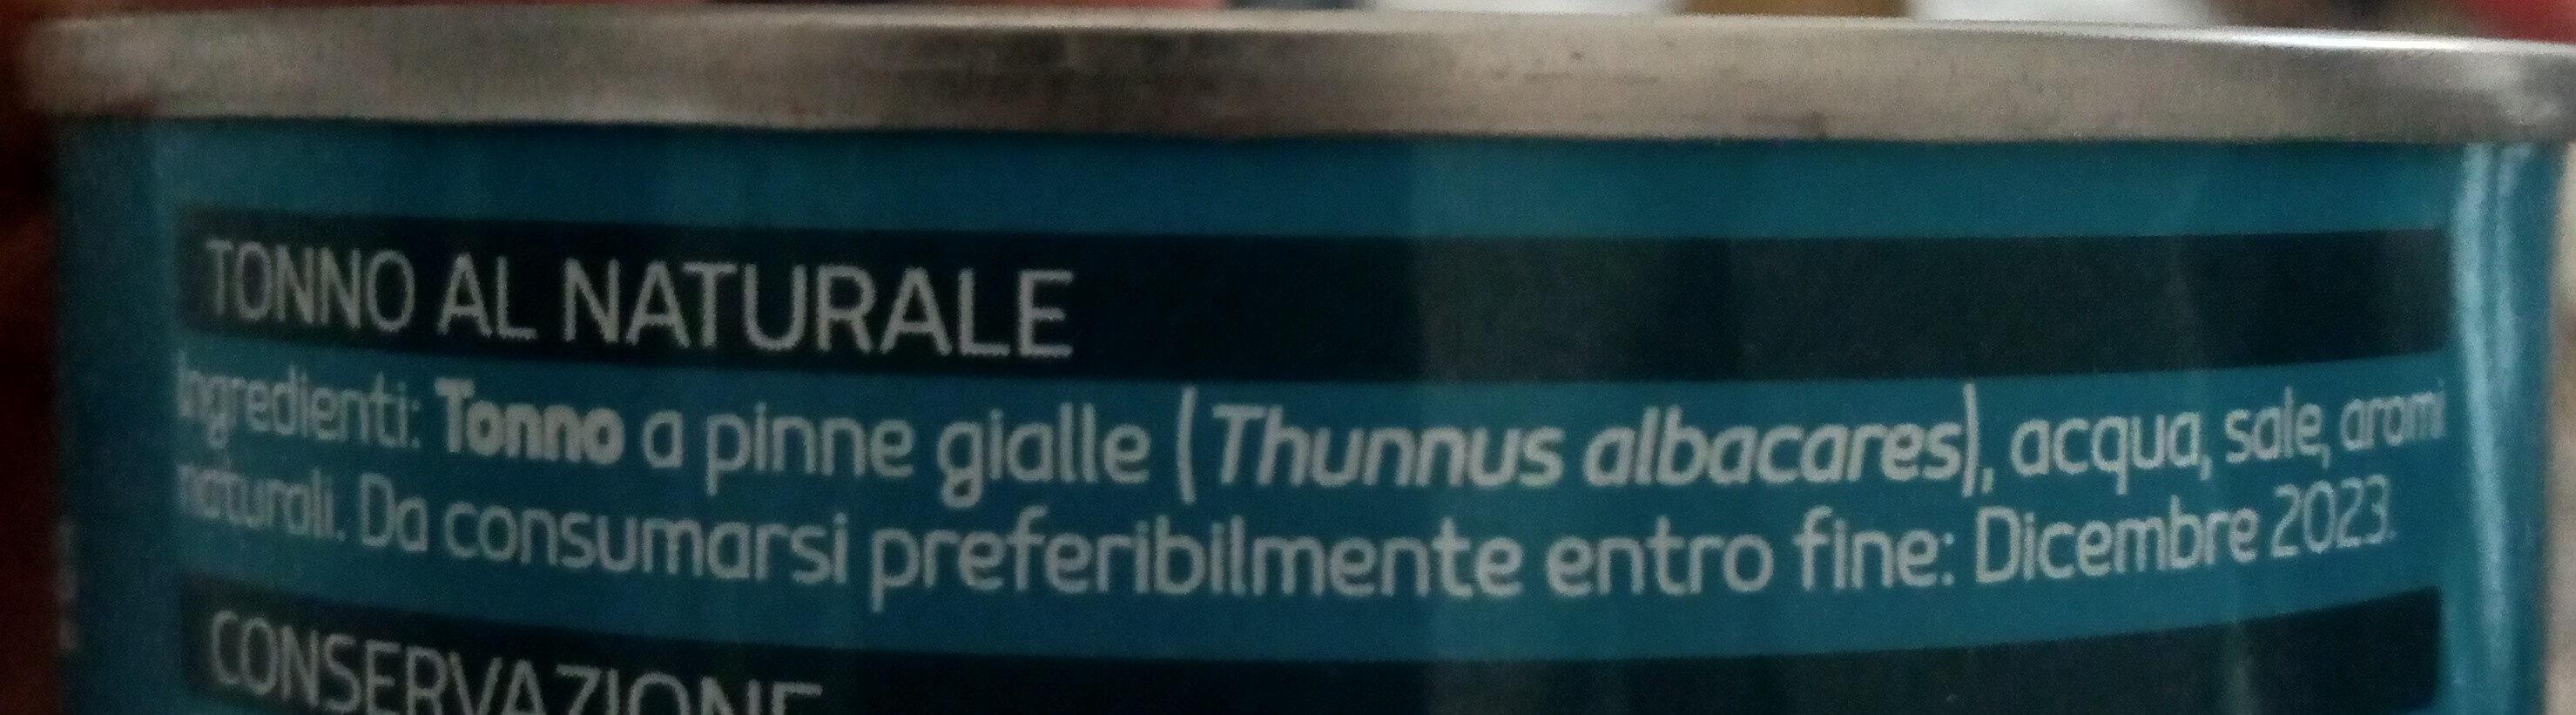 Selex Tonno al Naturale - Ingredienti - it